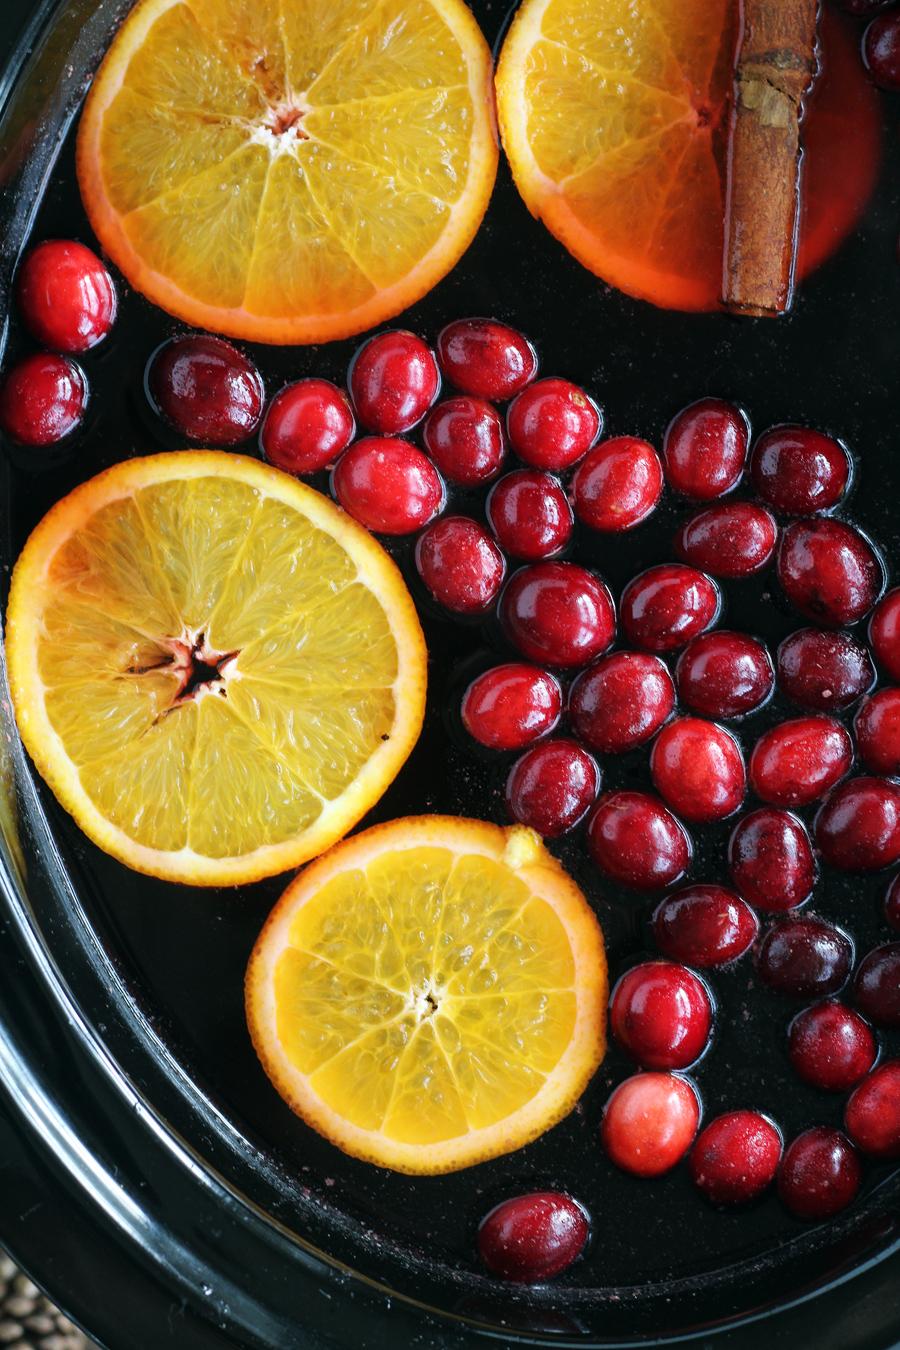 Fresh orange slices, cinnamon and cranberries floating in a crock pot of warm apple cider